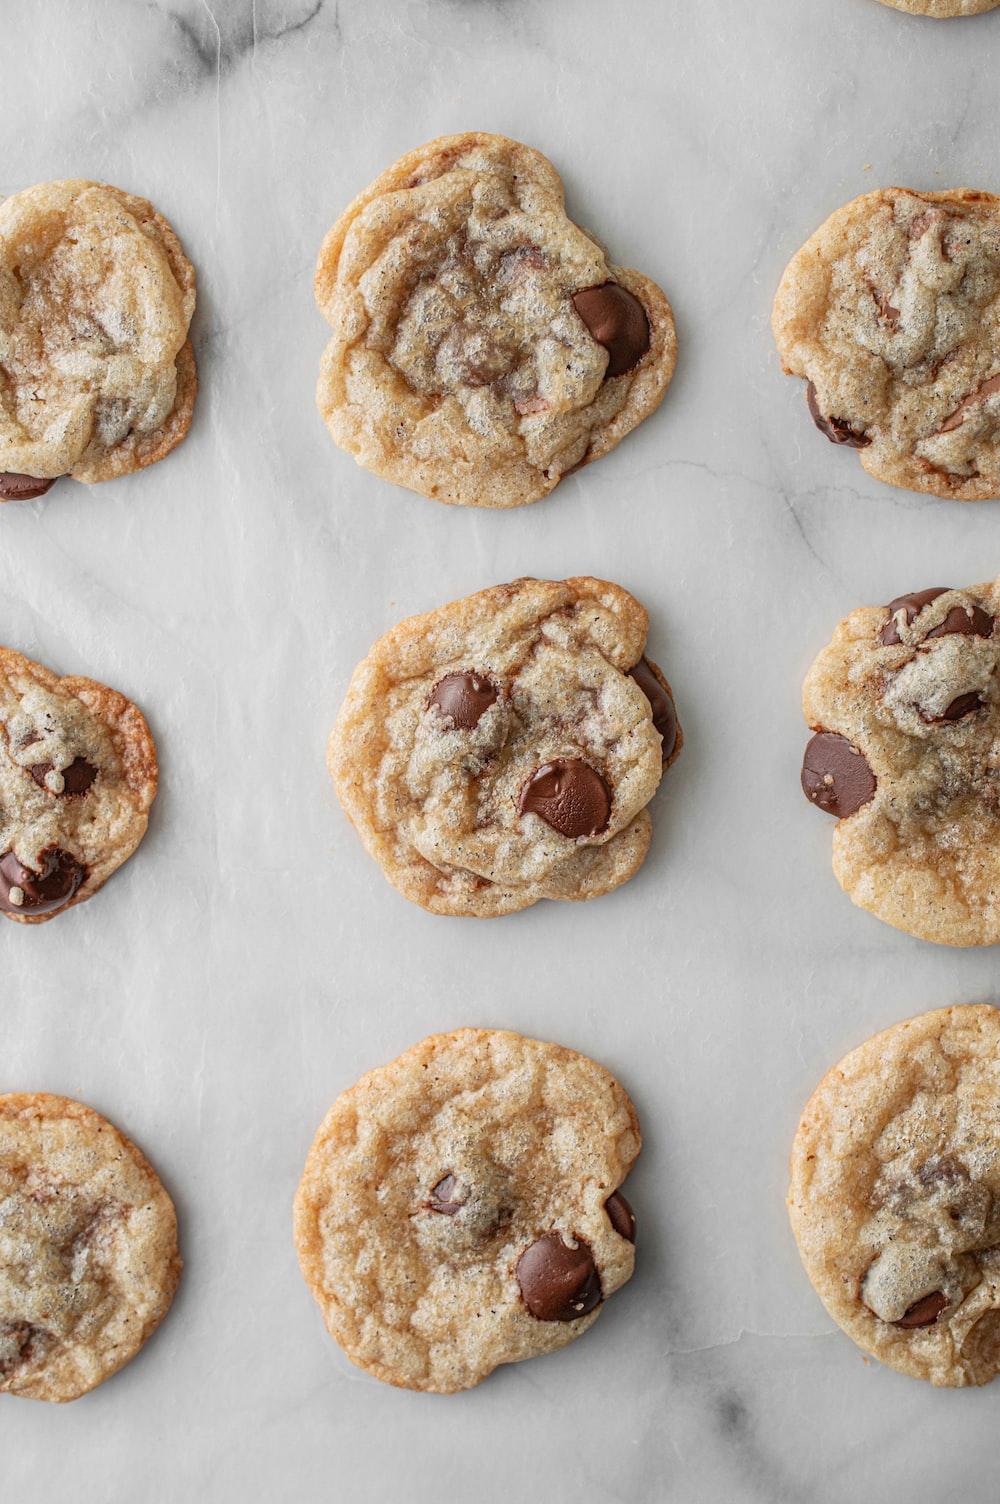 brown cookies on white textile